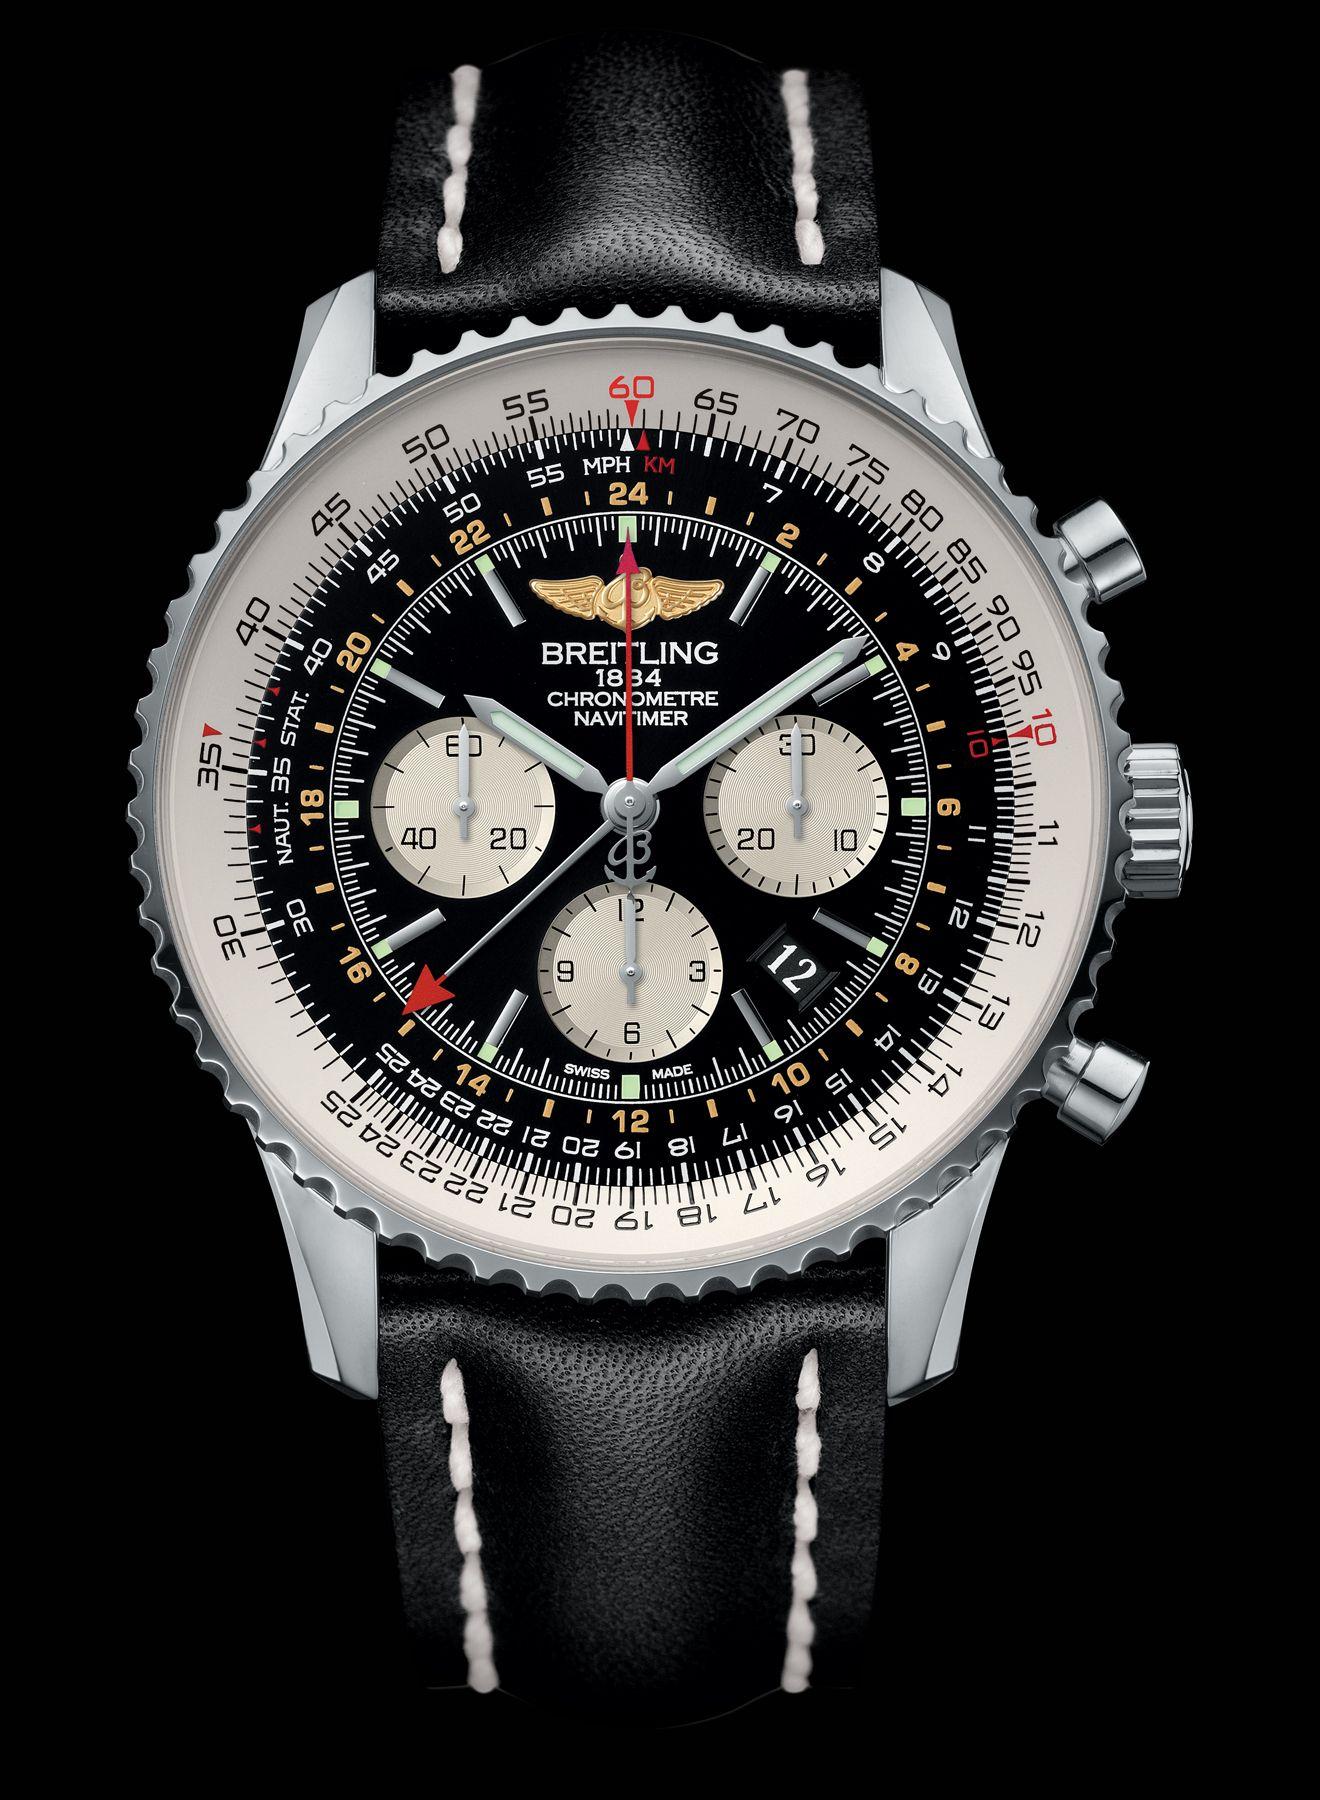 Navitimer GMT - Breitling - Instruments for Professionals | Breitling  navitimer, Breitling, Breitling watches mens